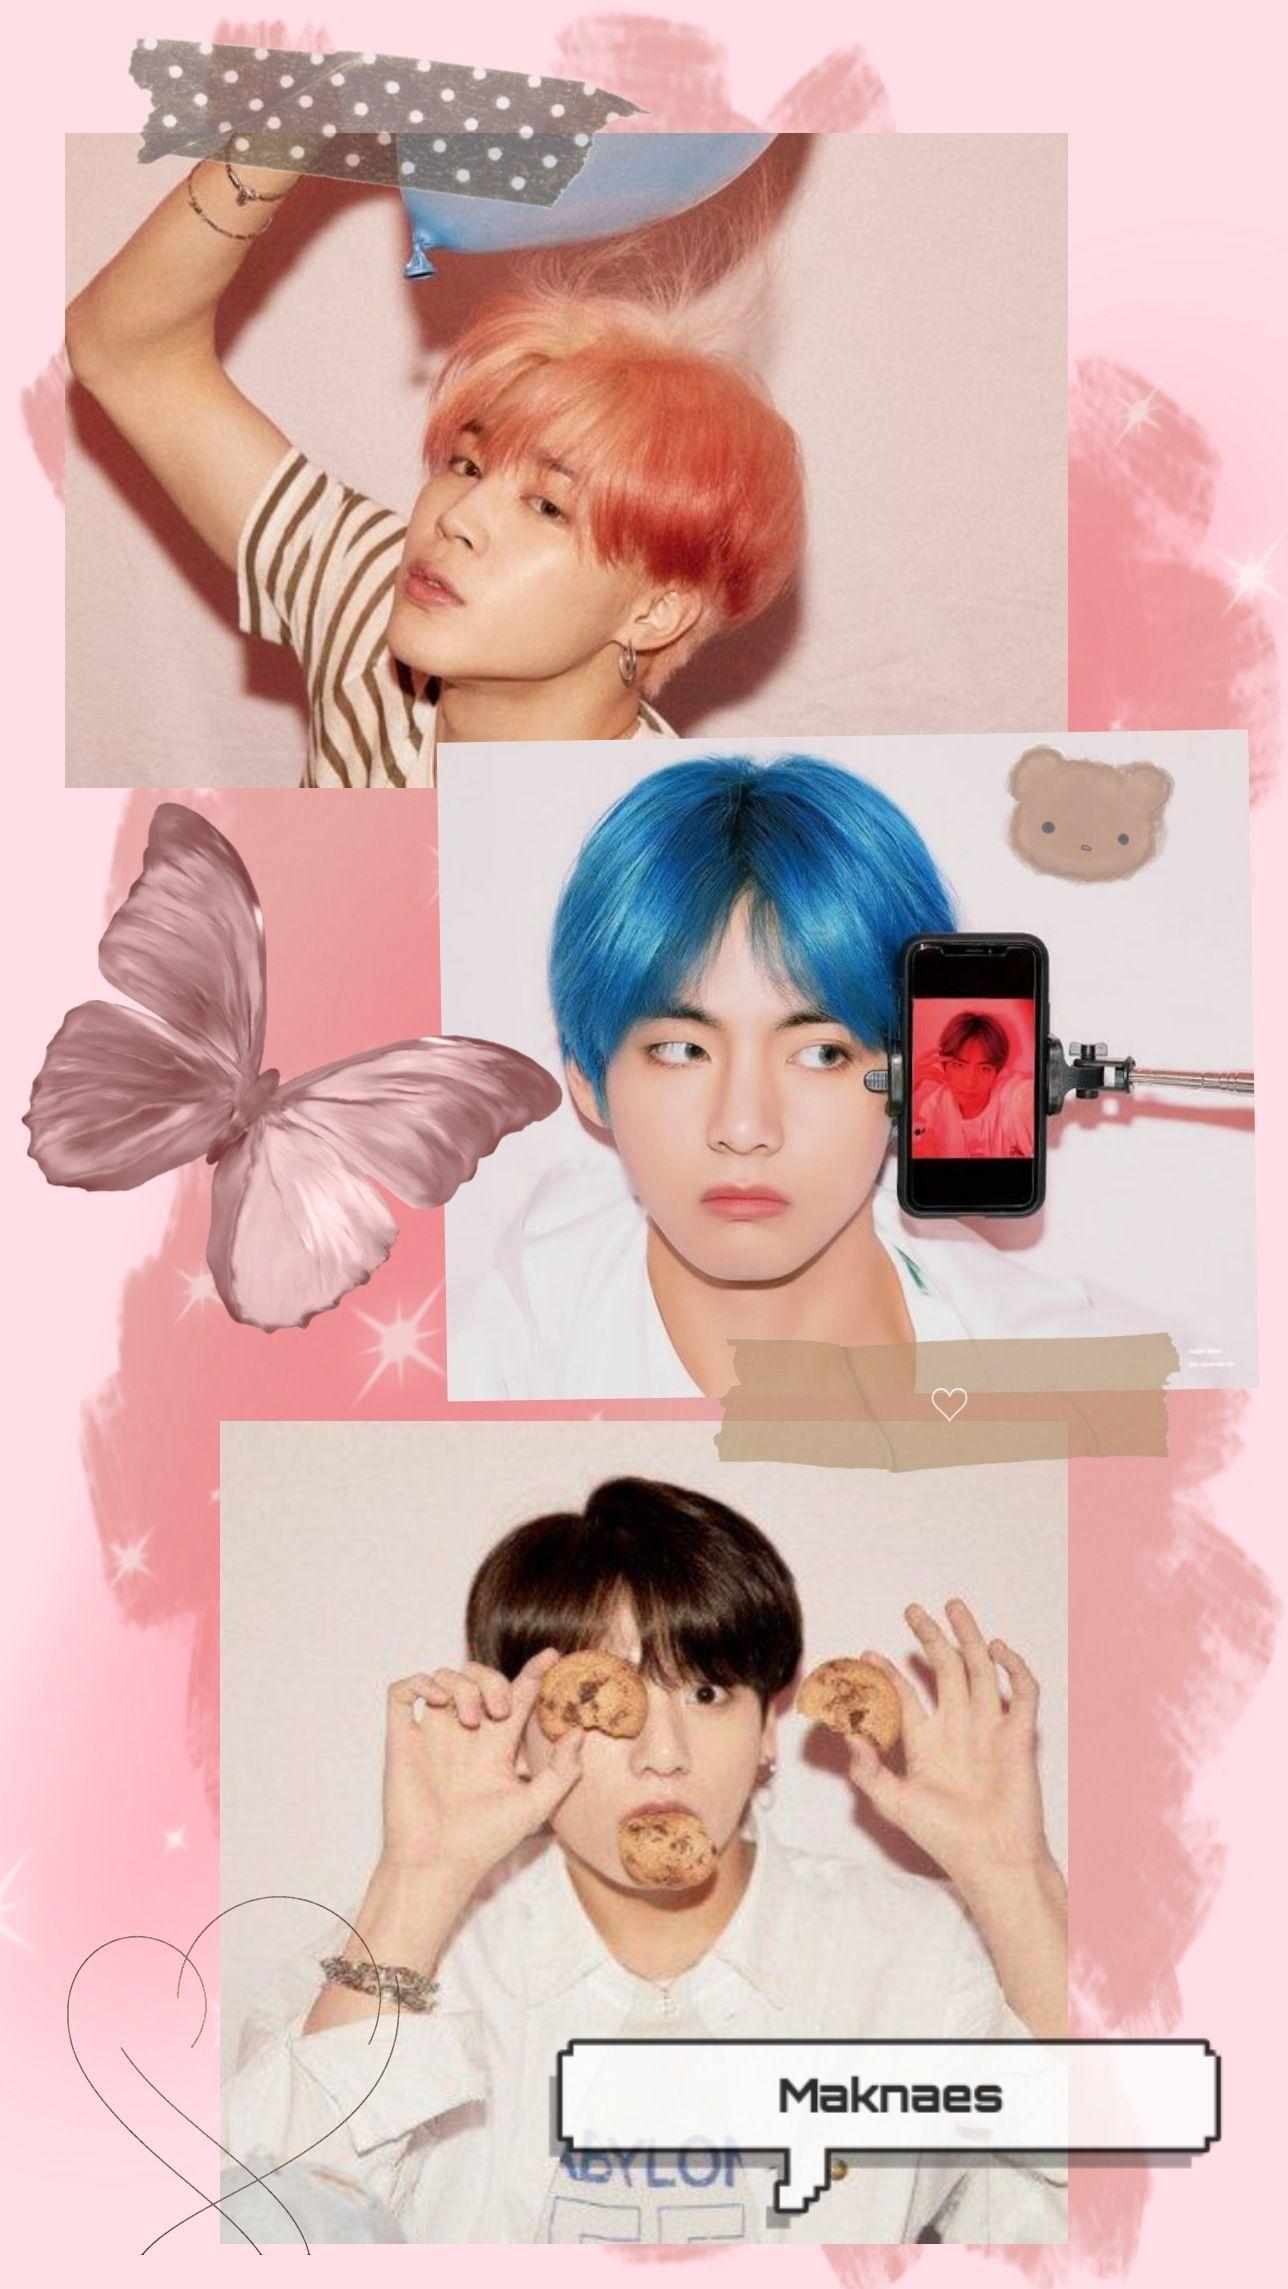 Bts Pink Maknae Line Bts Maknae Line Bts Maknae Line Wallpaper Cute Bts Wallpaper Bts wallpaper 2021 pink